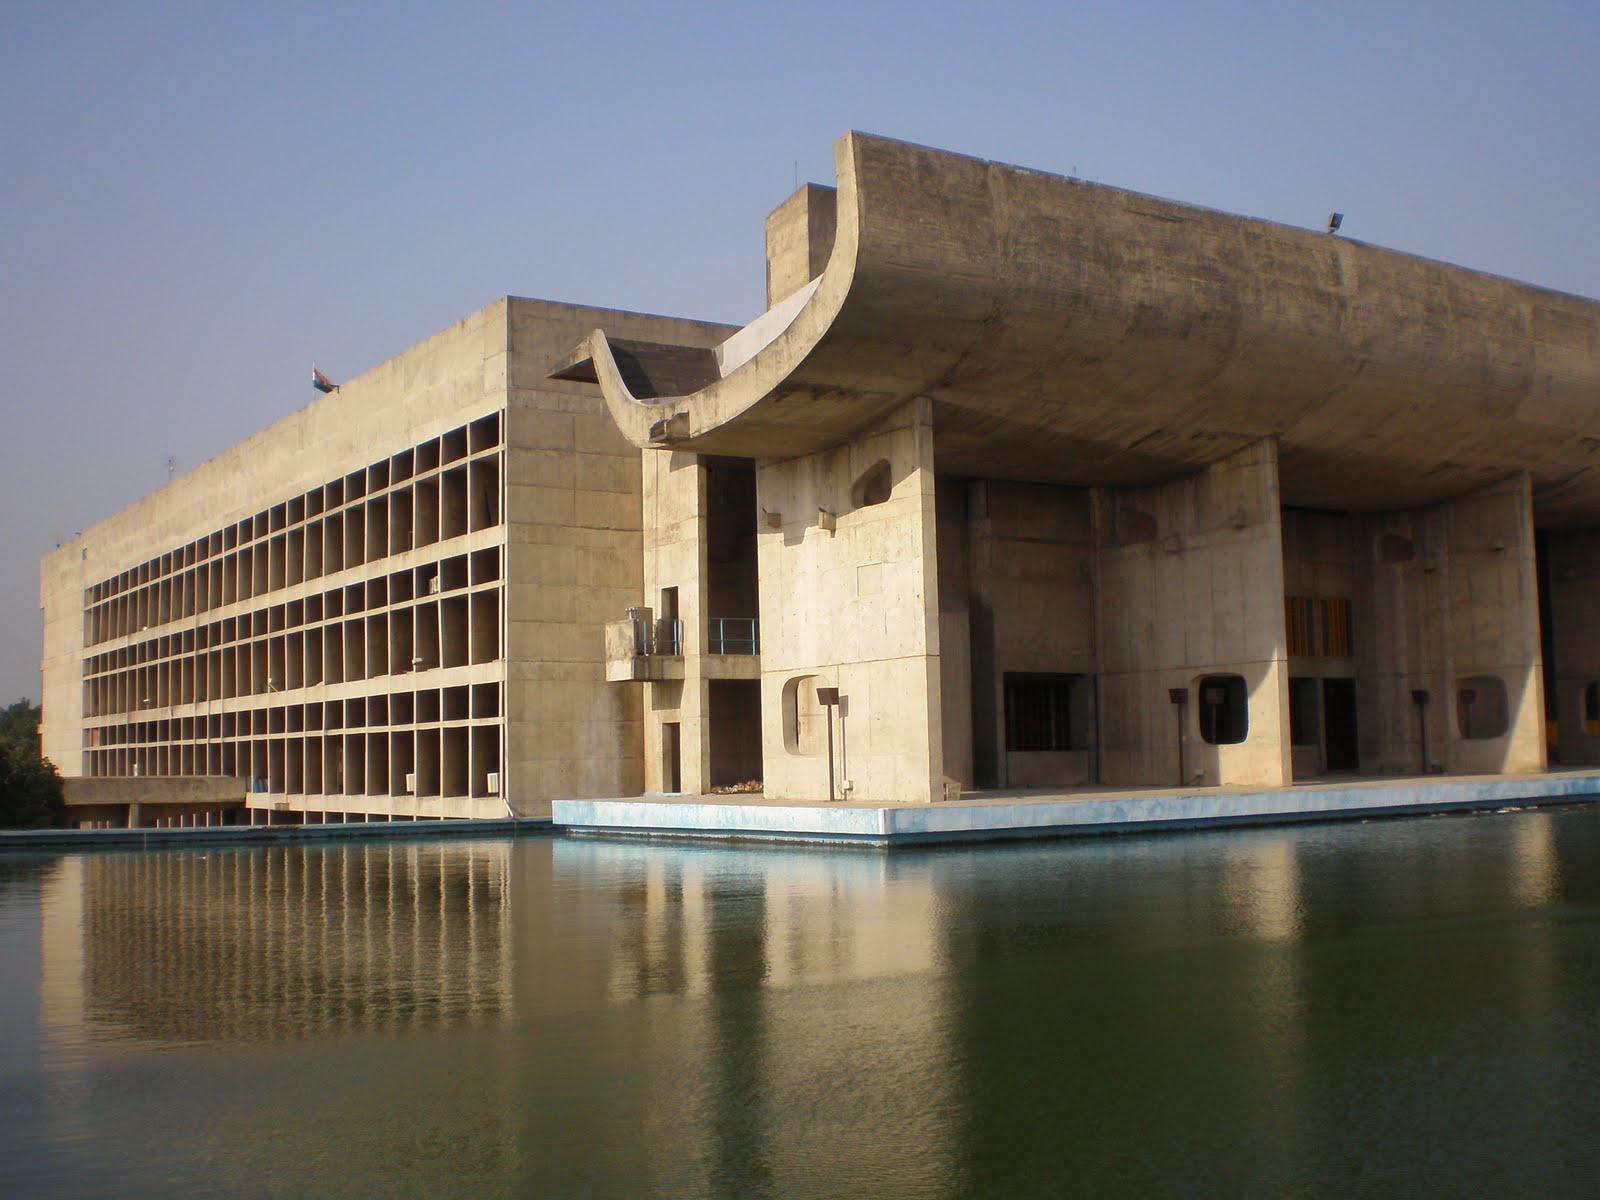 Spontaneous architecture chadigarh for Architecture le corbusier